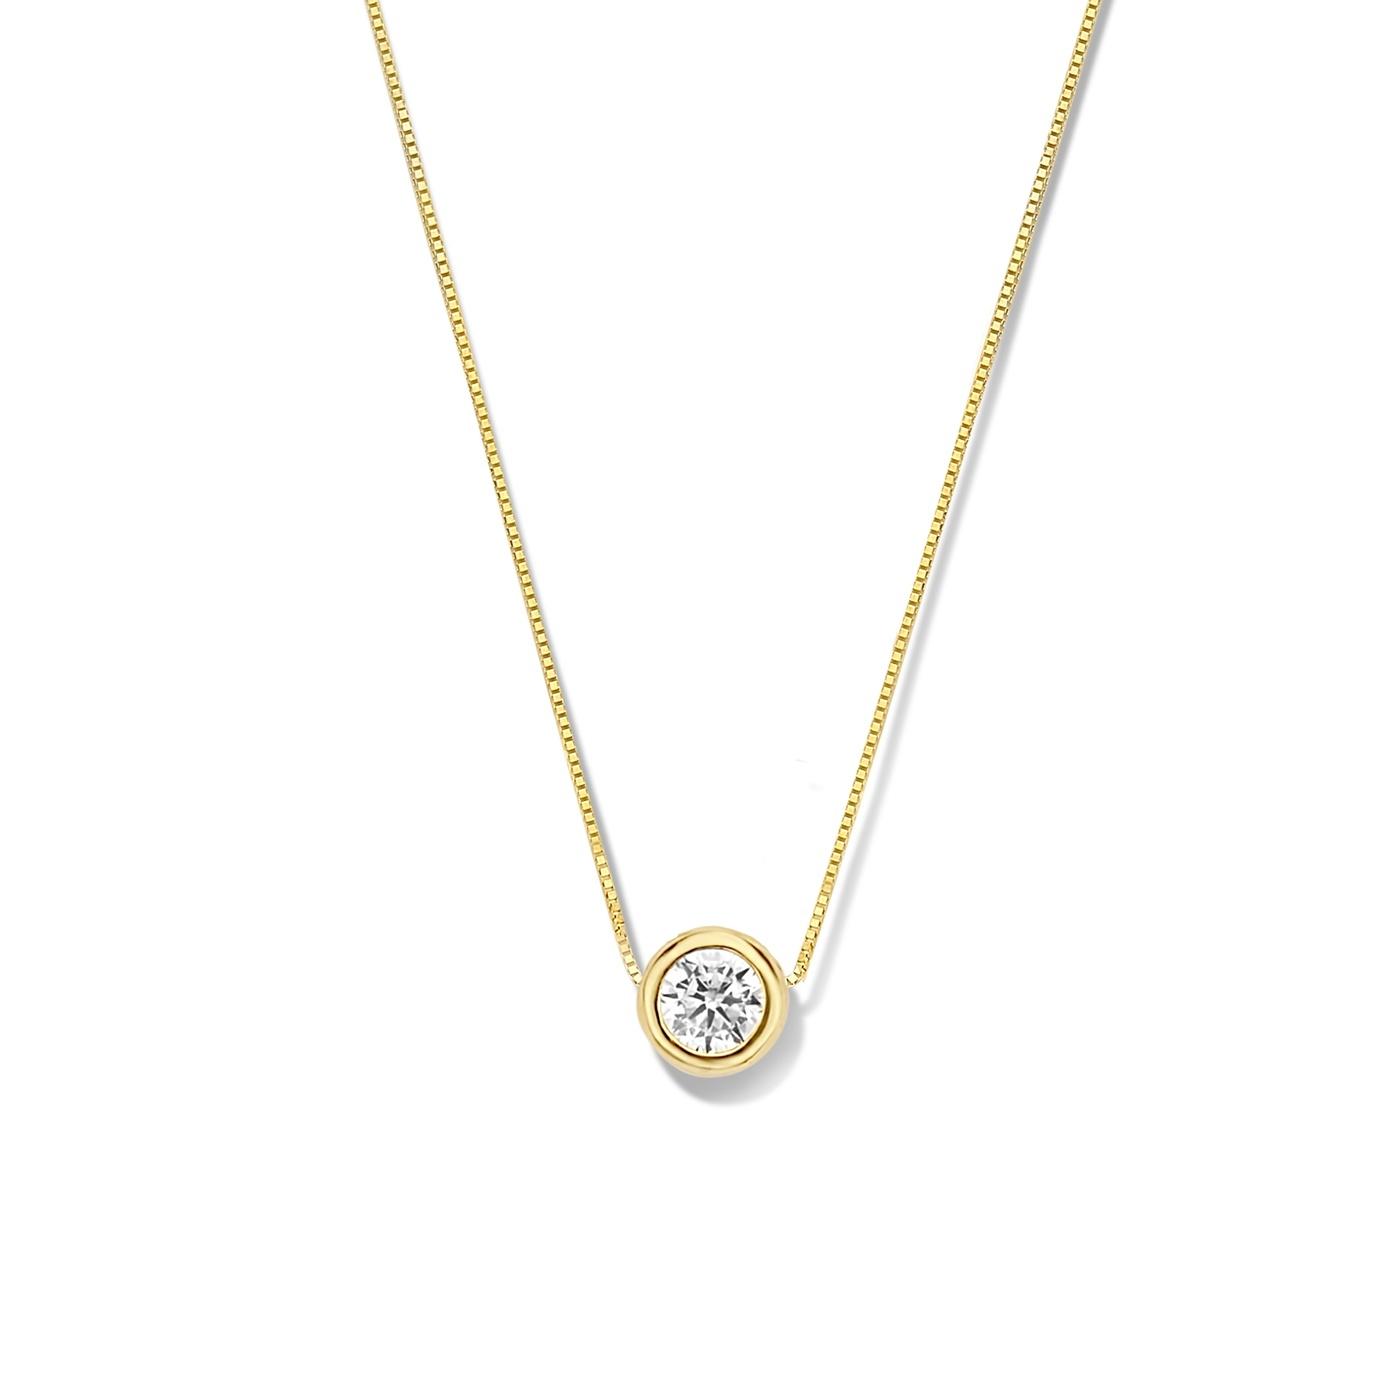 Isabel Bernard Le Marais Lison 14 karat gold necklace with zirconia